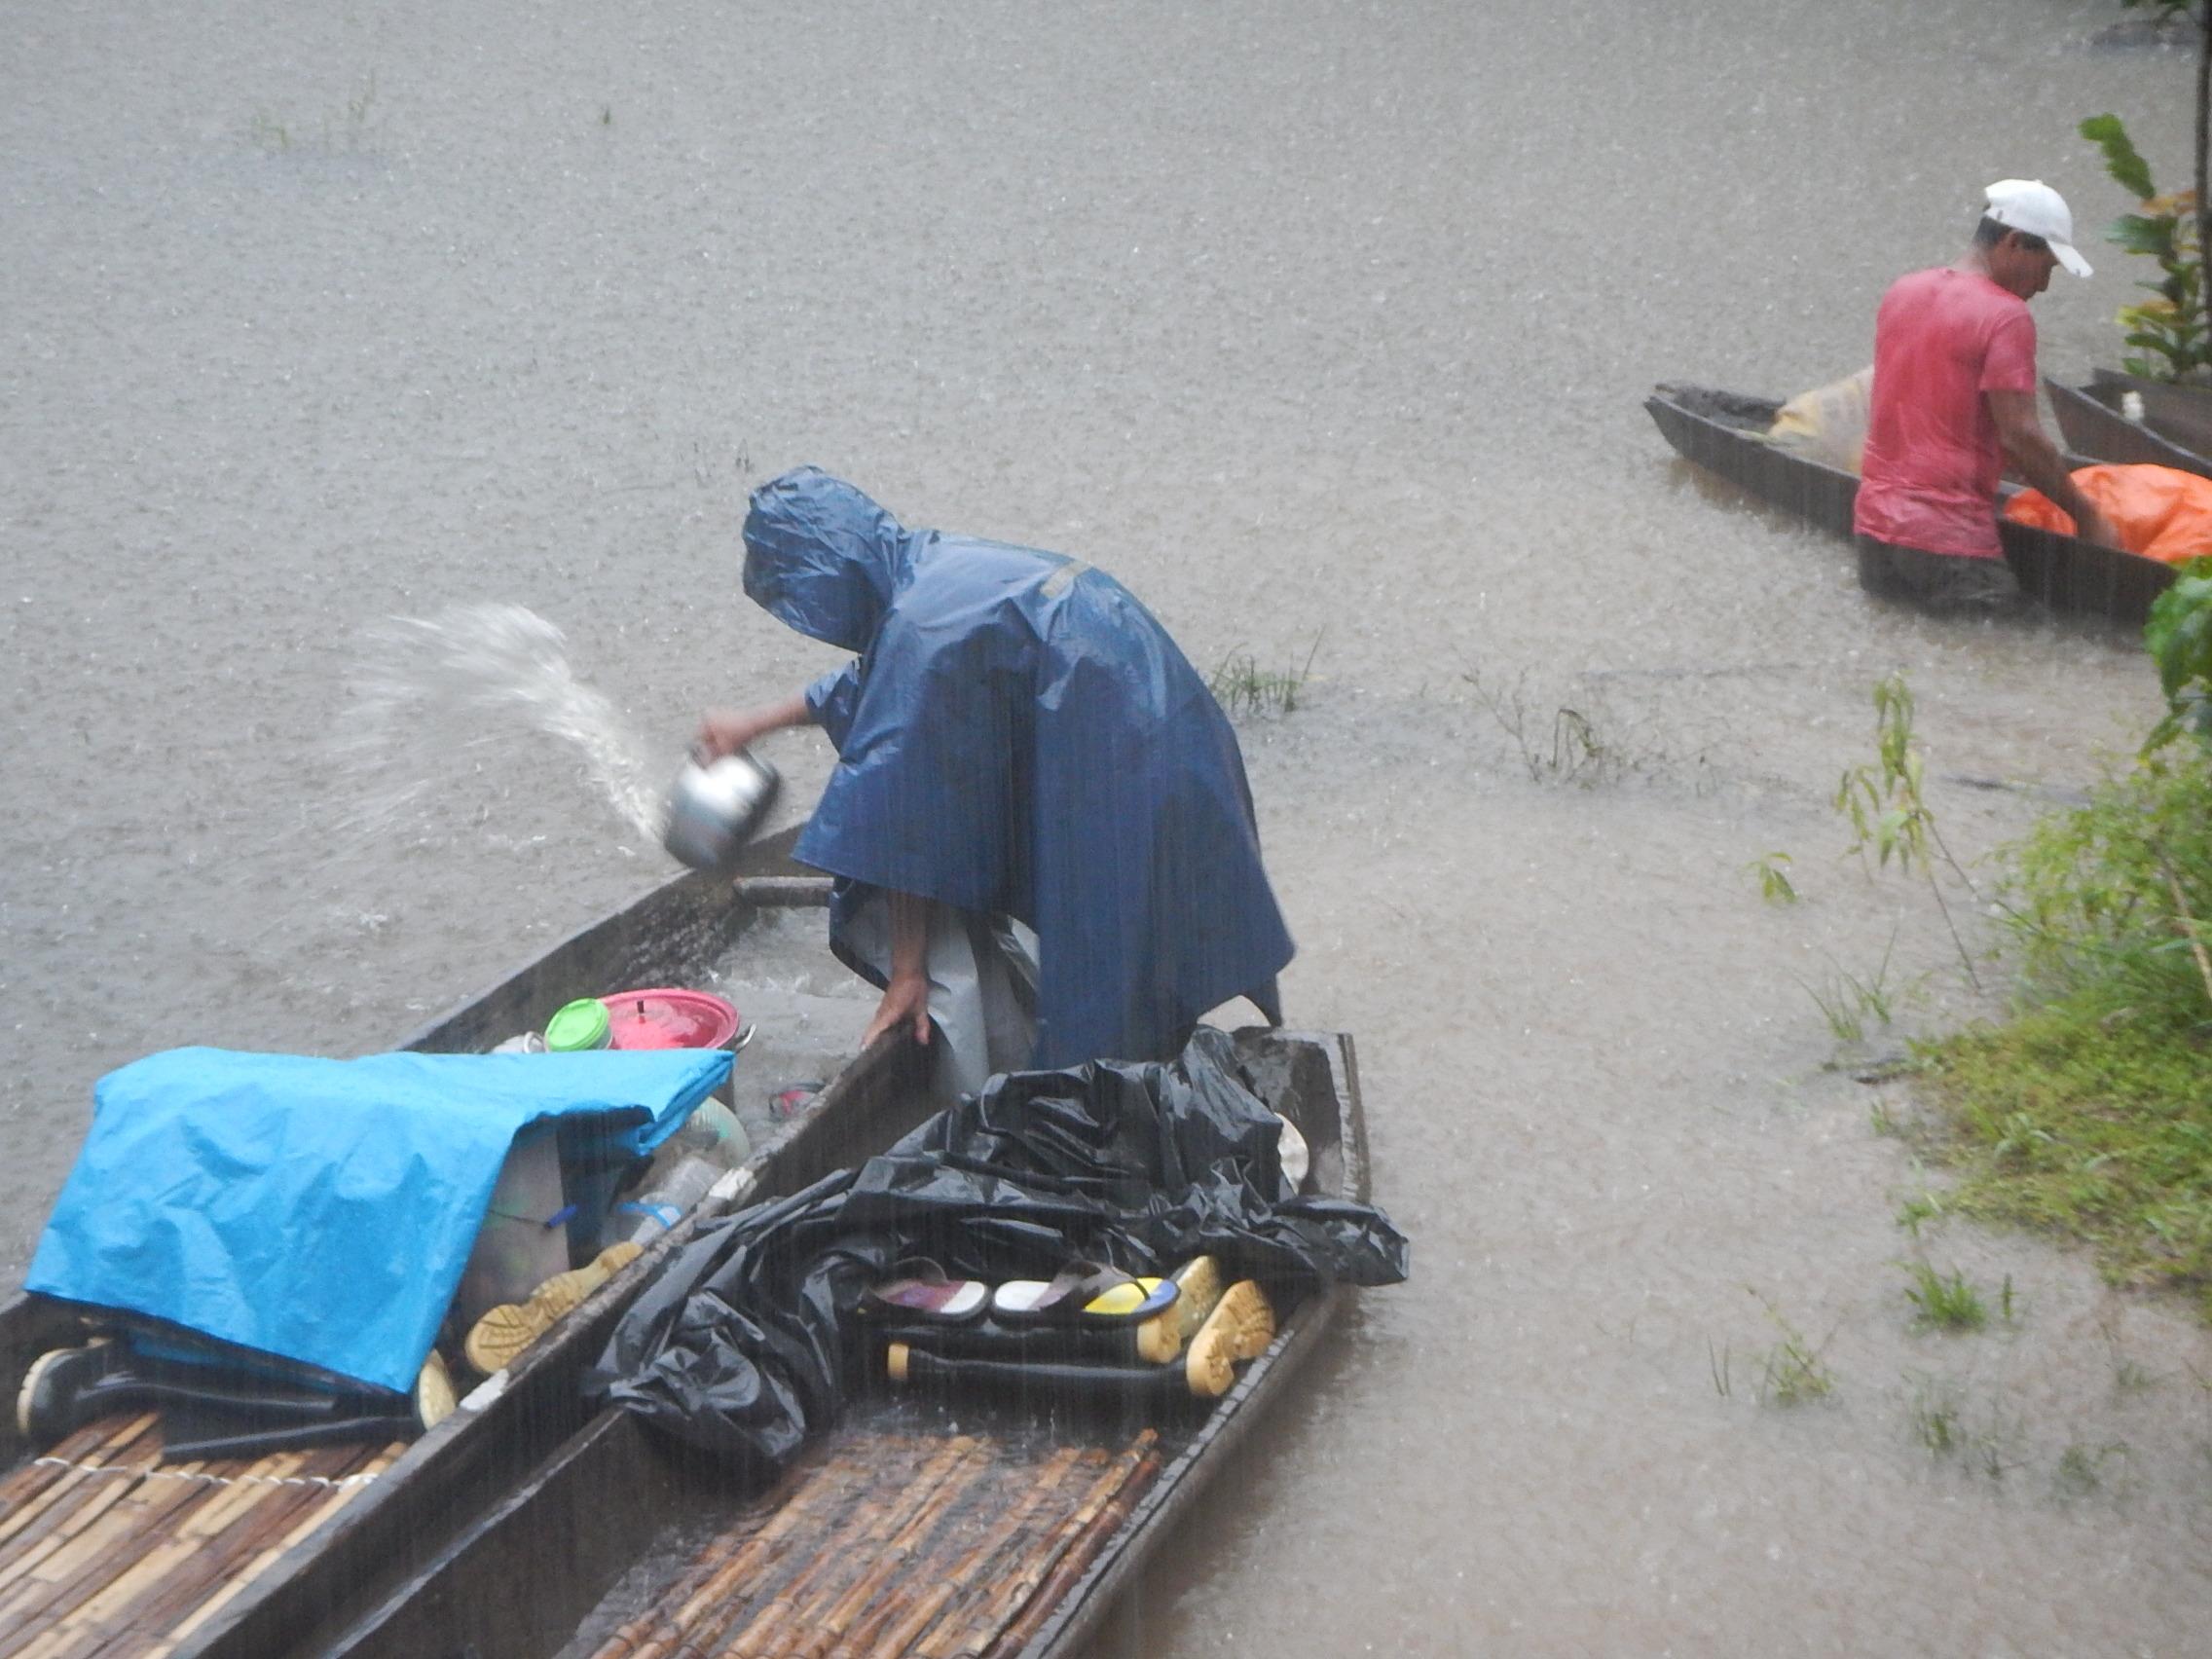 Bailing a Canoe